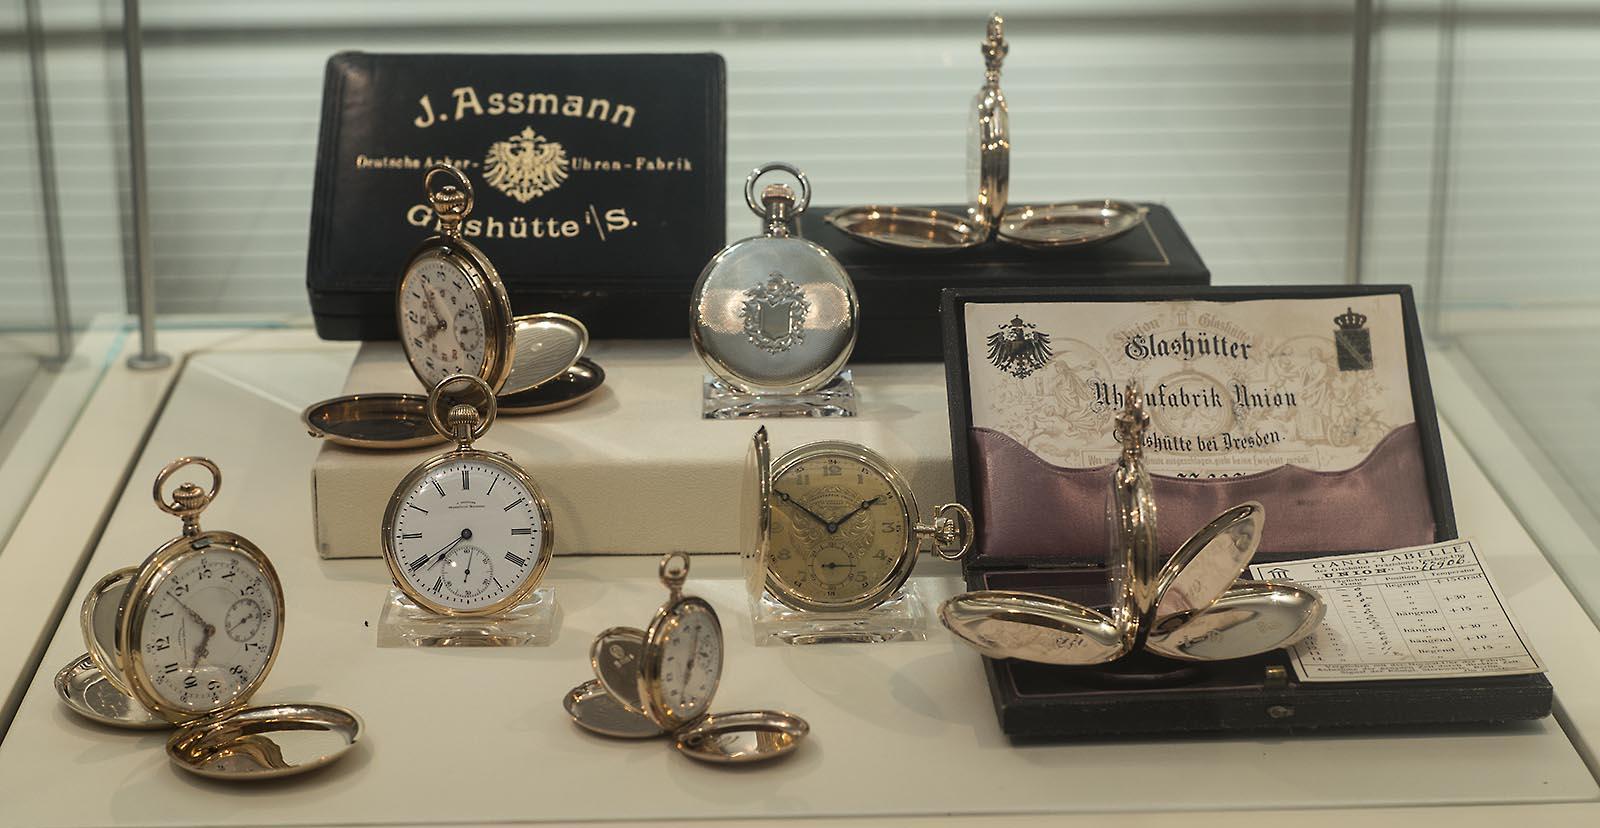 Uhrenmanfaktur Glashütte Original